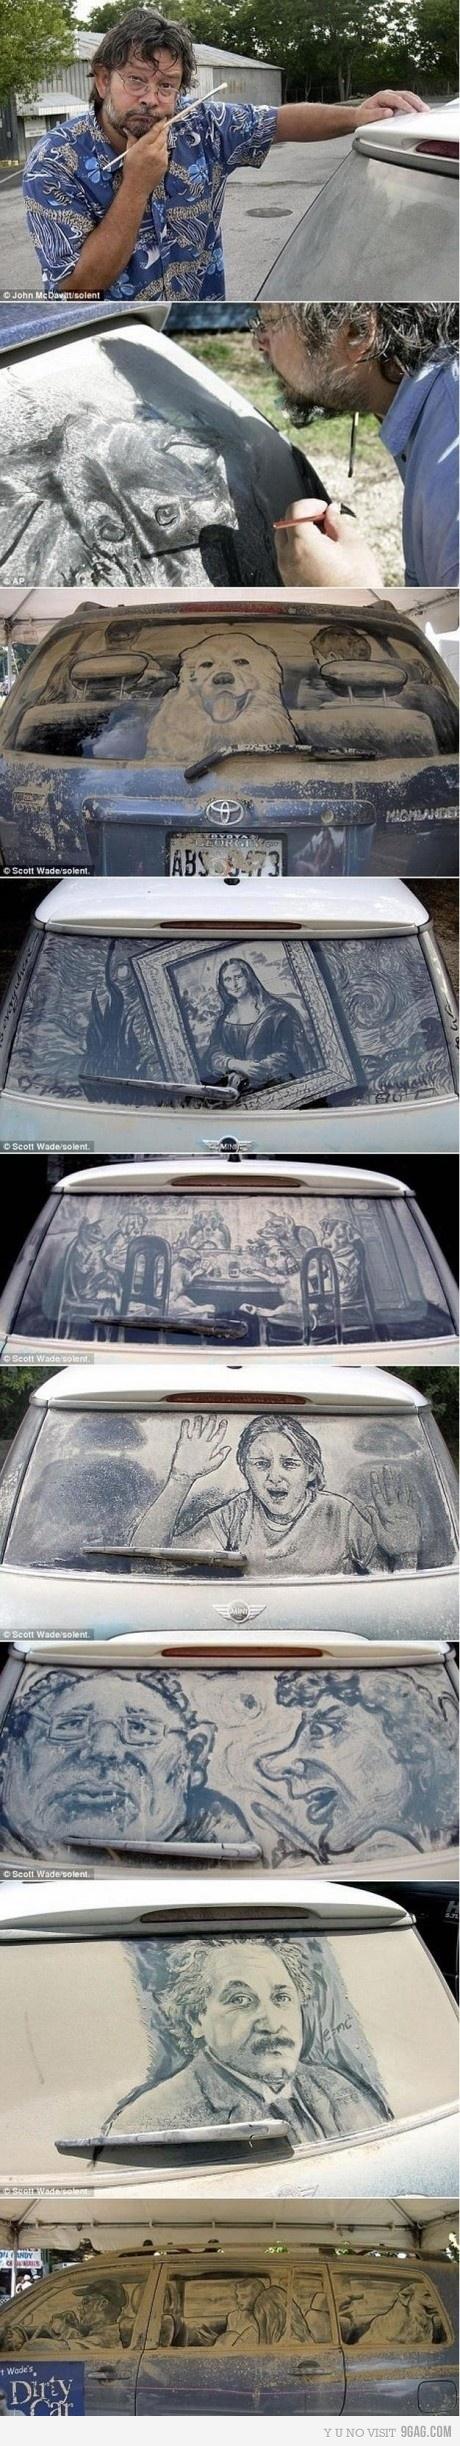 Carro sujo de poeira e desenhado no vidro